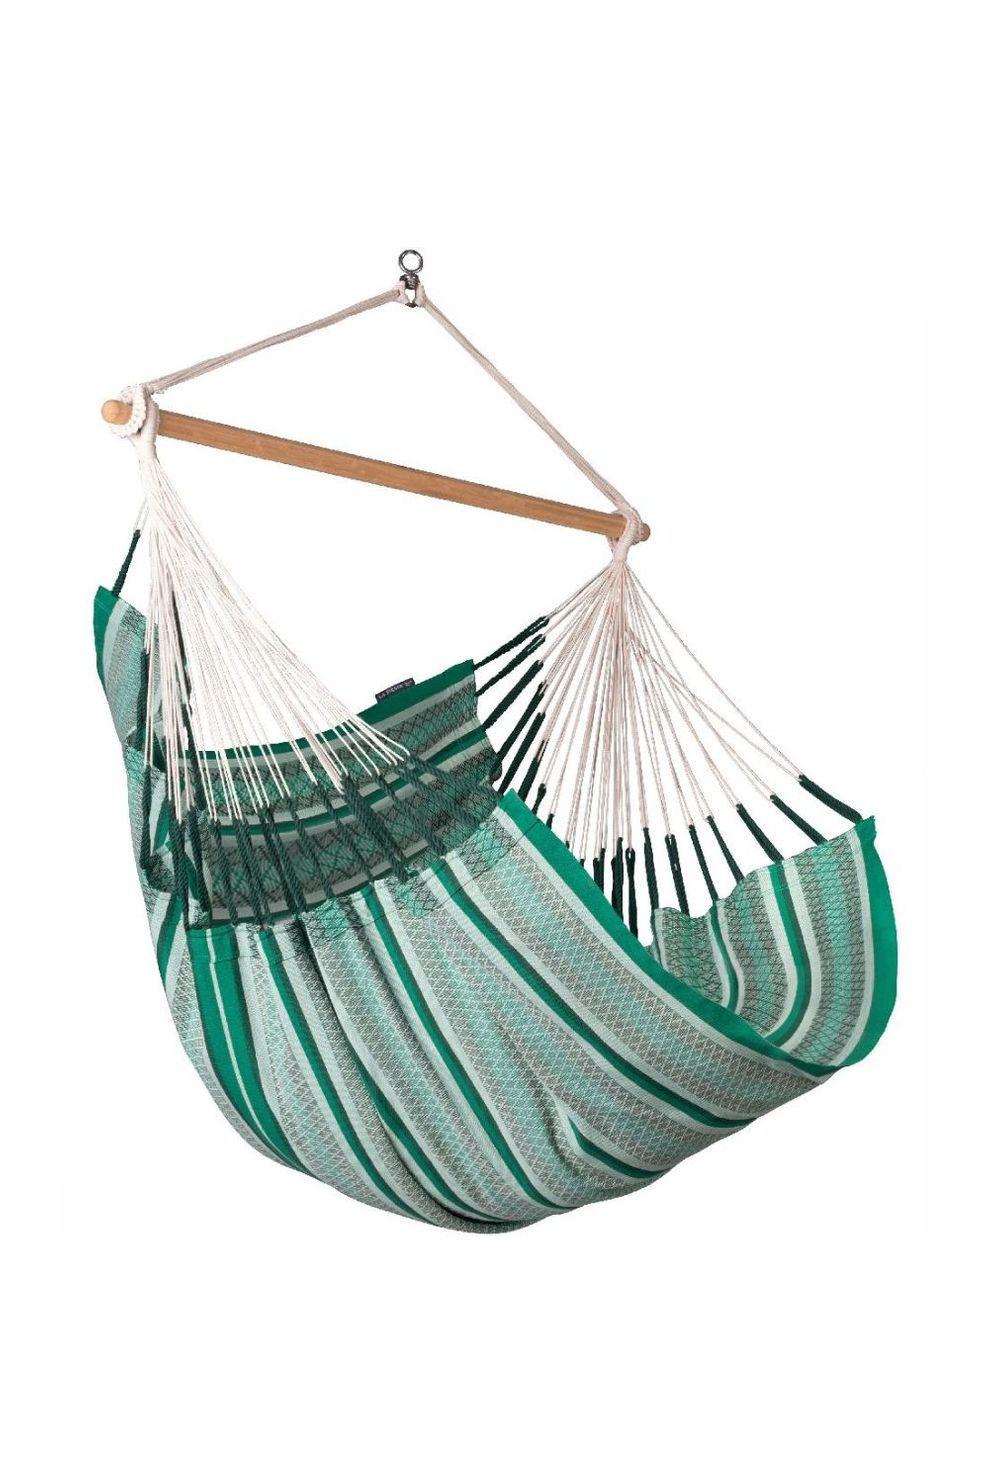 La Siesta Hangmat Habana Hammock Chair - Groen/ Gemengd